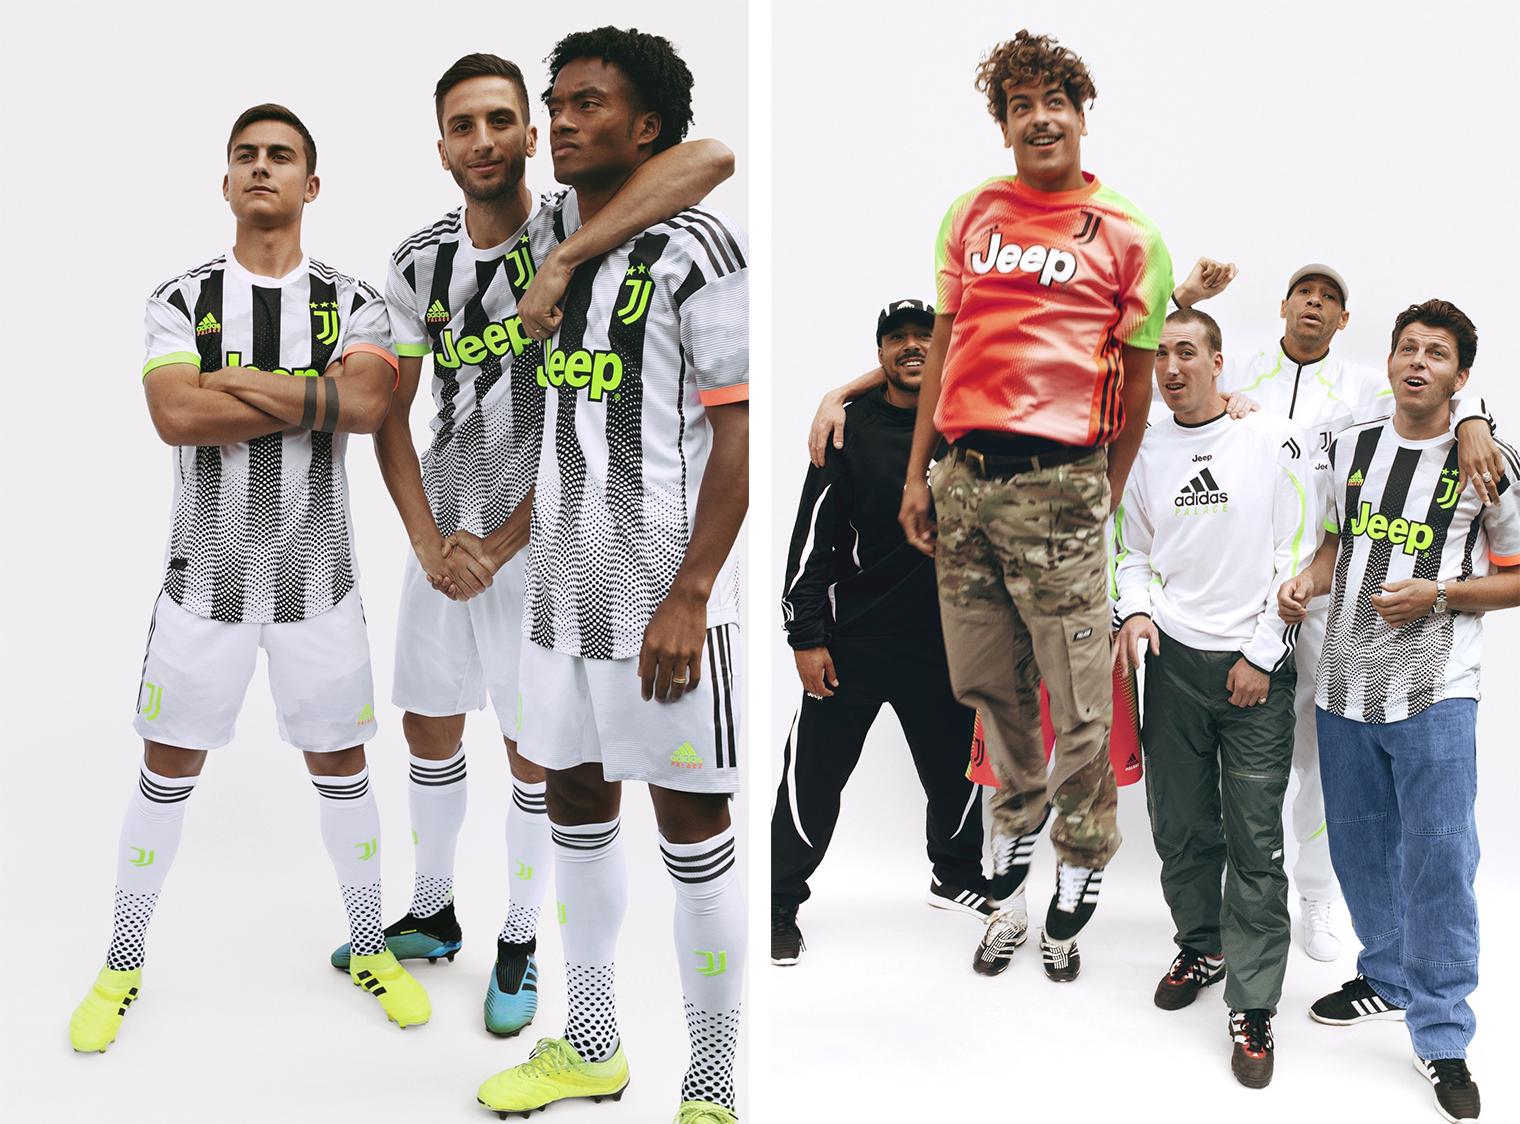 Juventus x Palace x adidas Football - полная коллекция